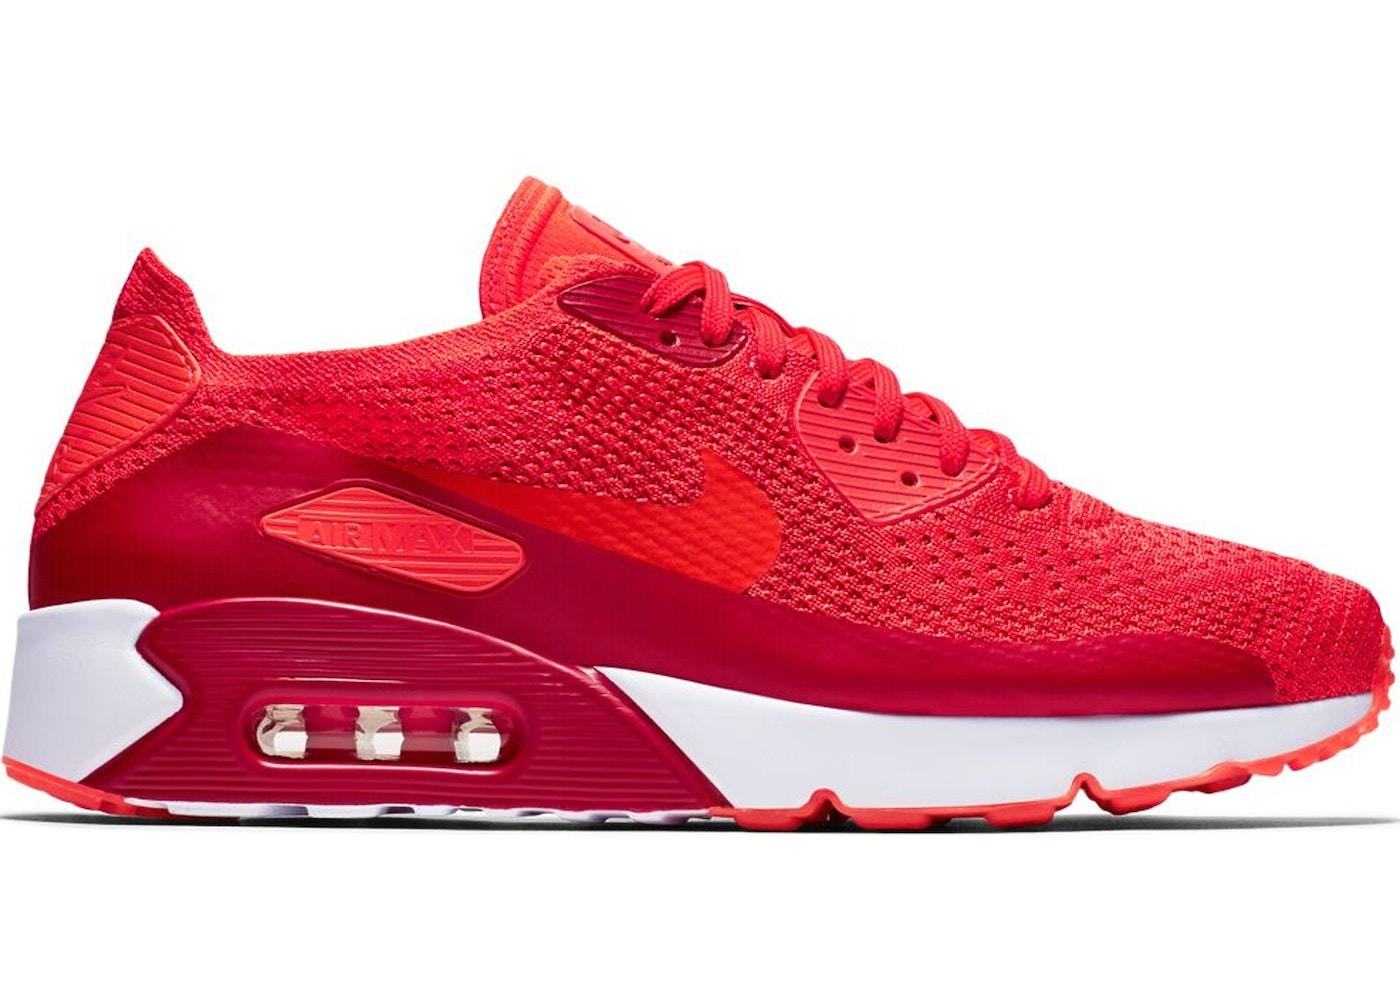 Nike Air Max 90 Ultra 2.0 Flyknit Bright Crimson 10.5 875943 600